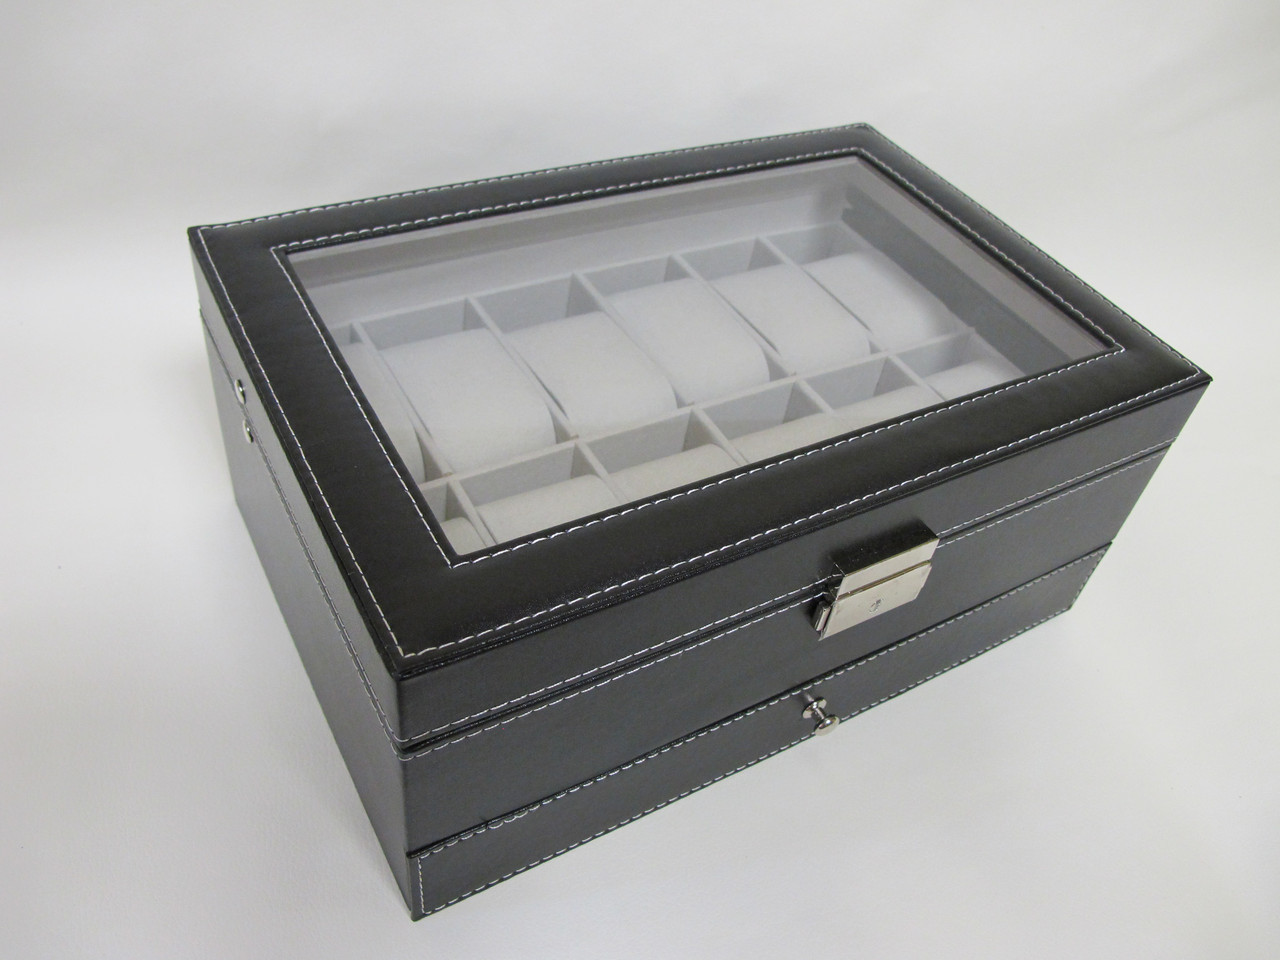 Шкатулка для хранения часов Craft 12WJ.PU